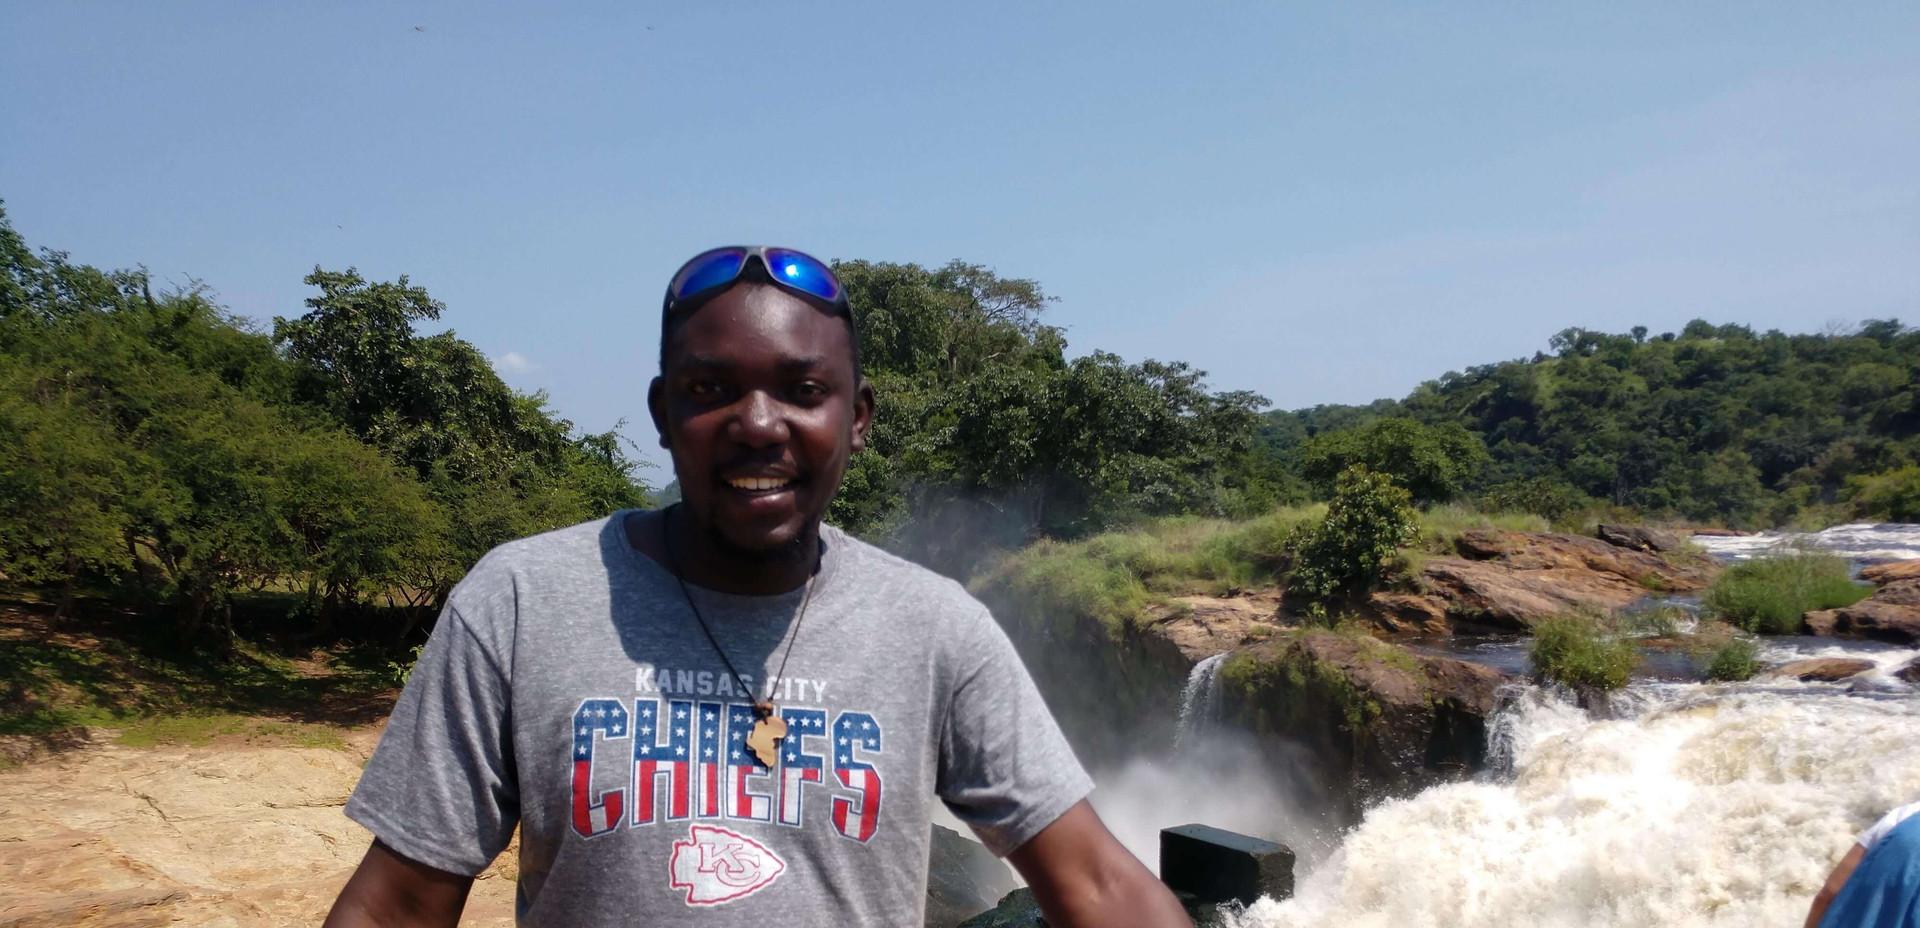 Fredrick at the rapids.